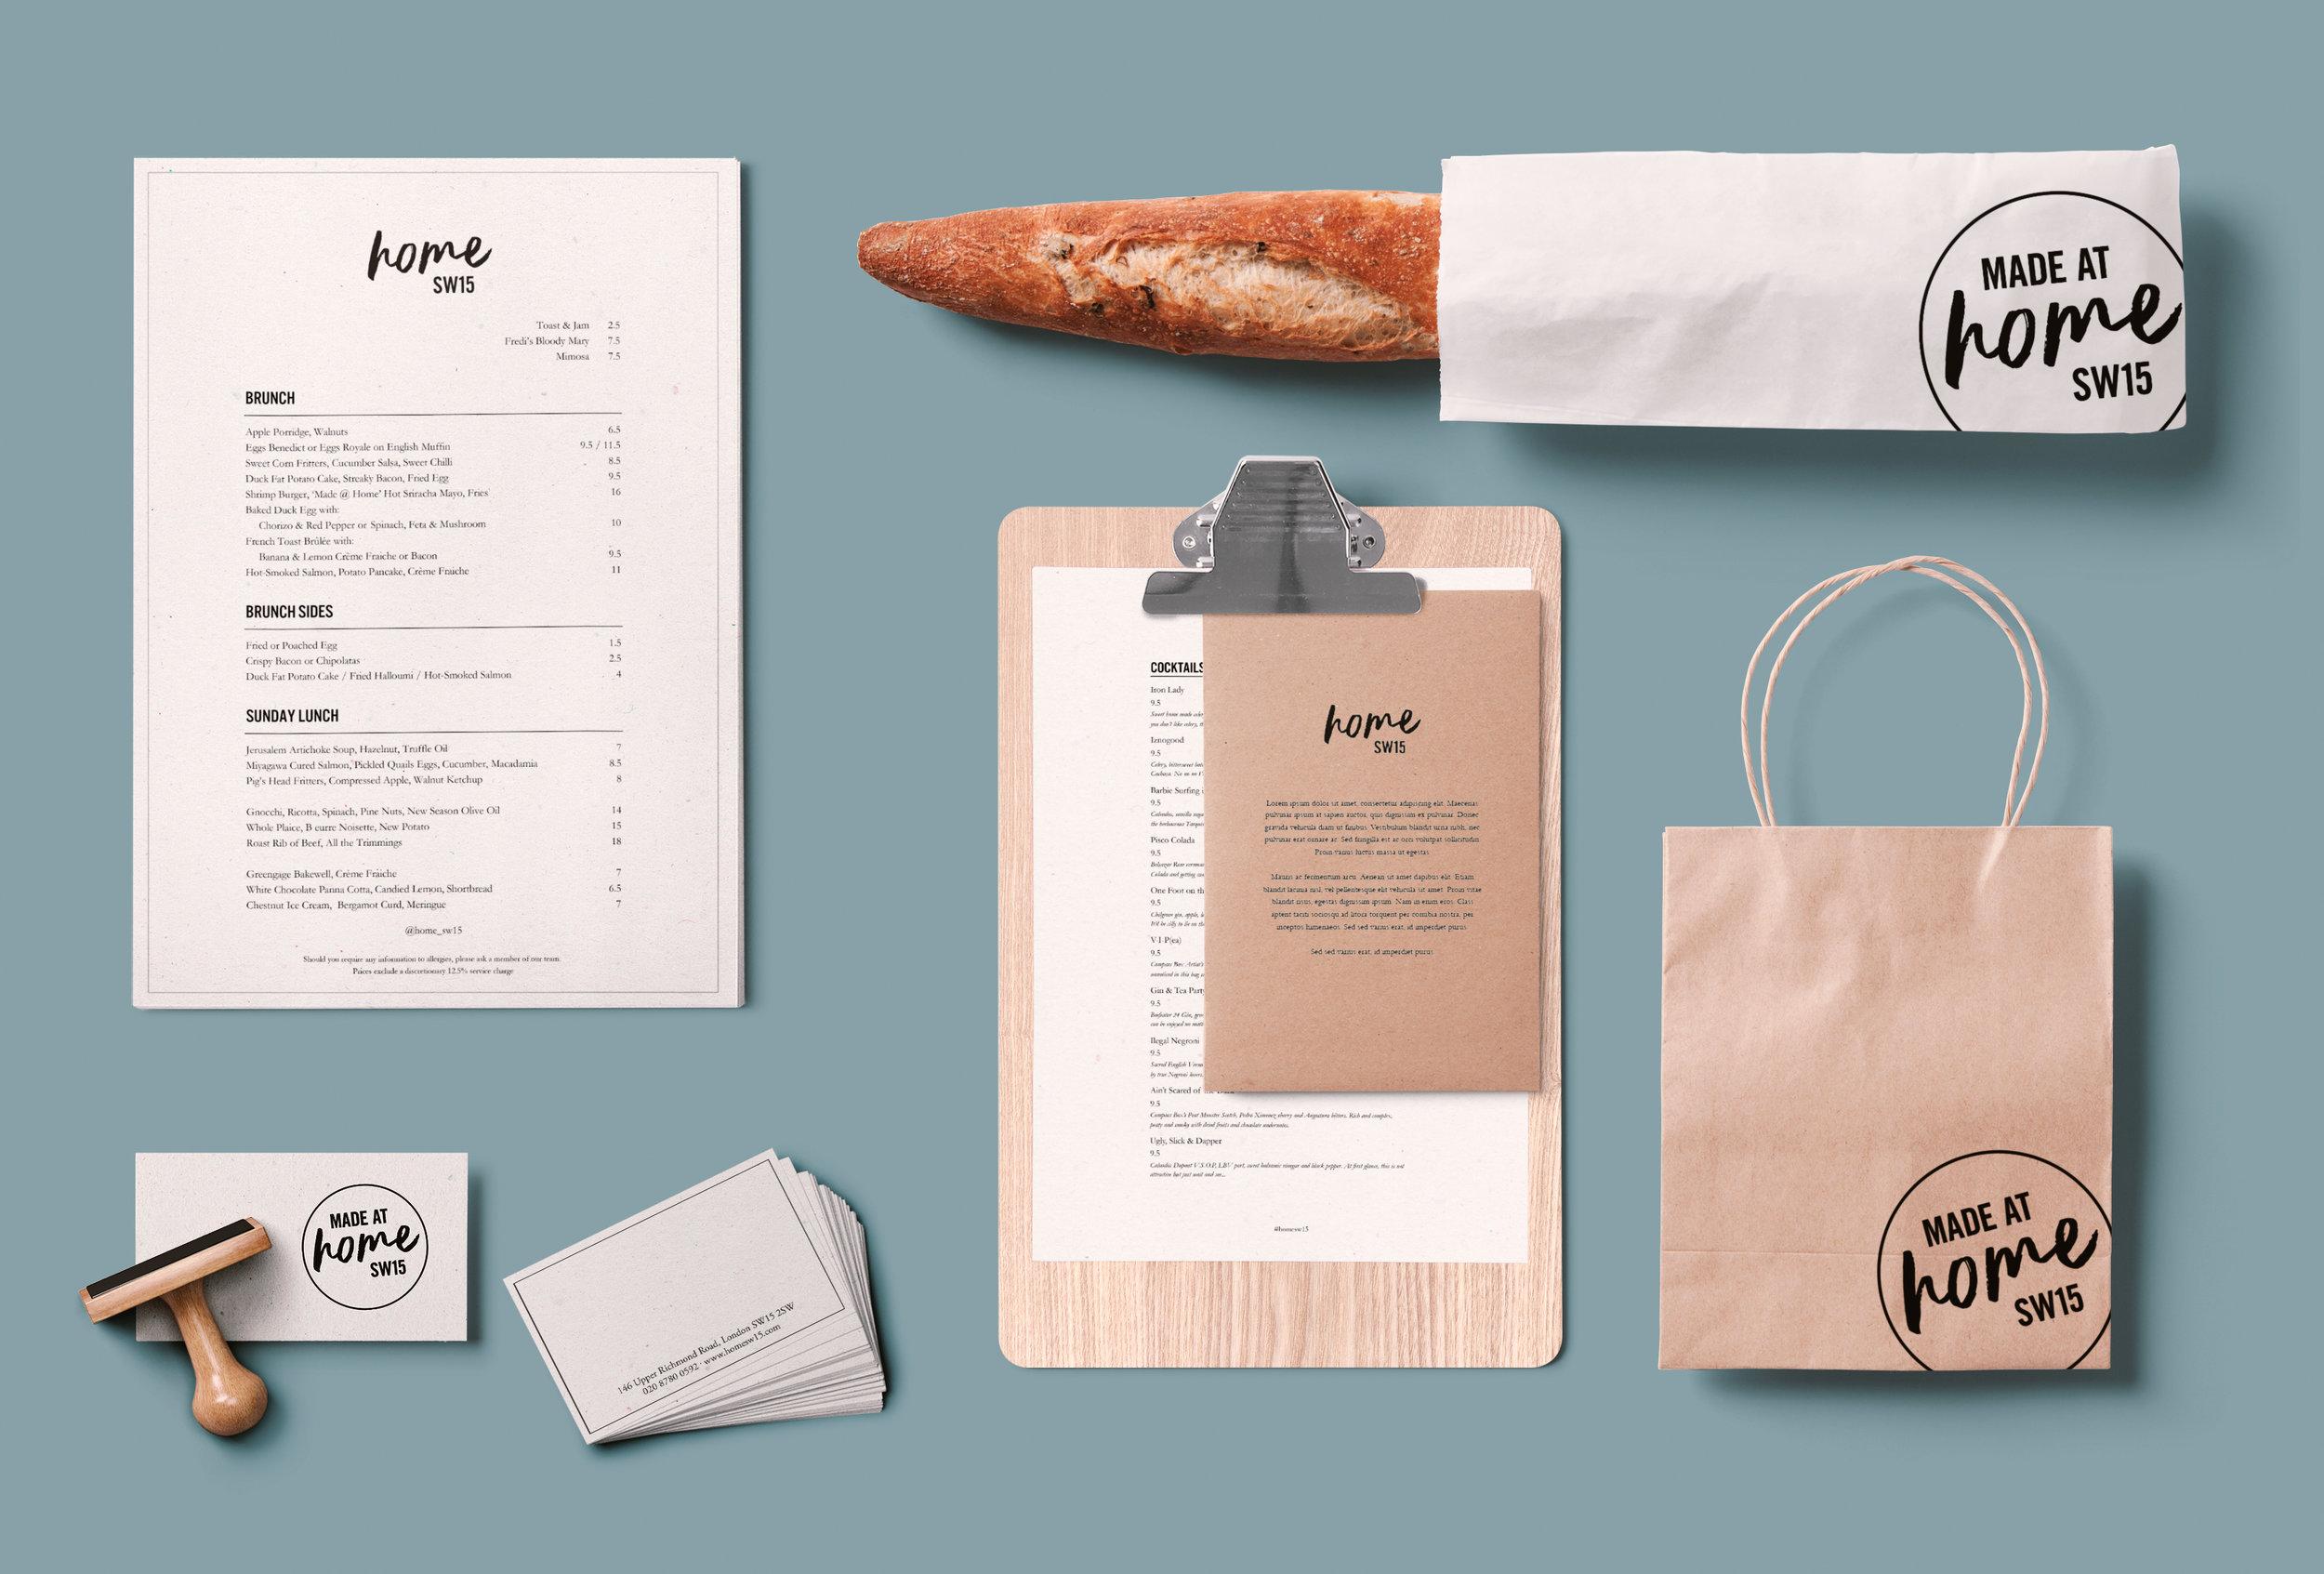 Farrah & Pearce Home SW15 restaurant stationary and packaging.jpg